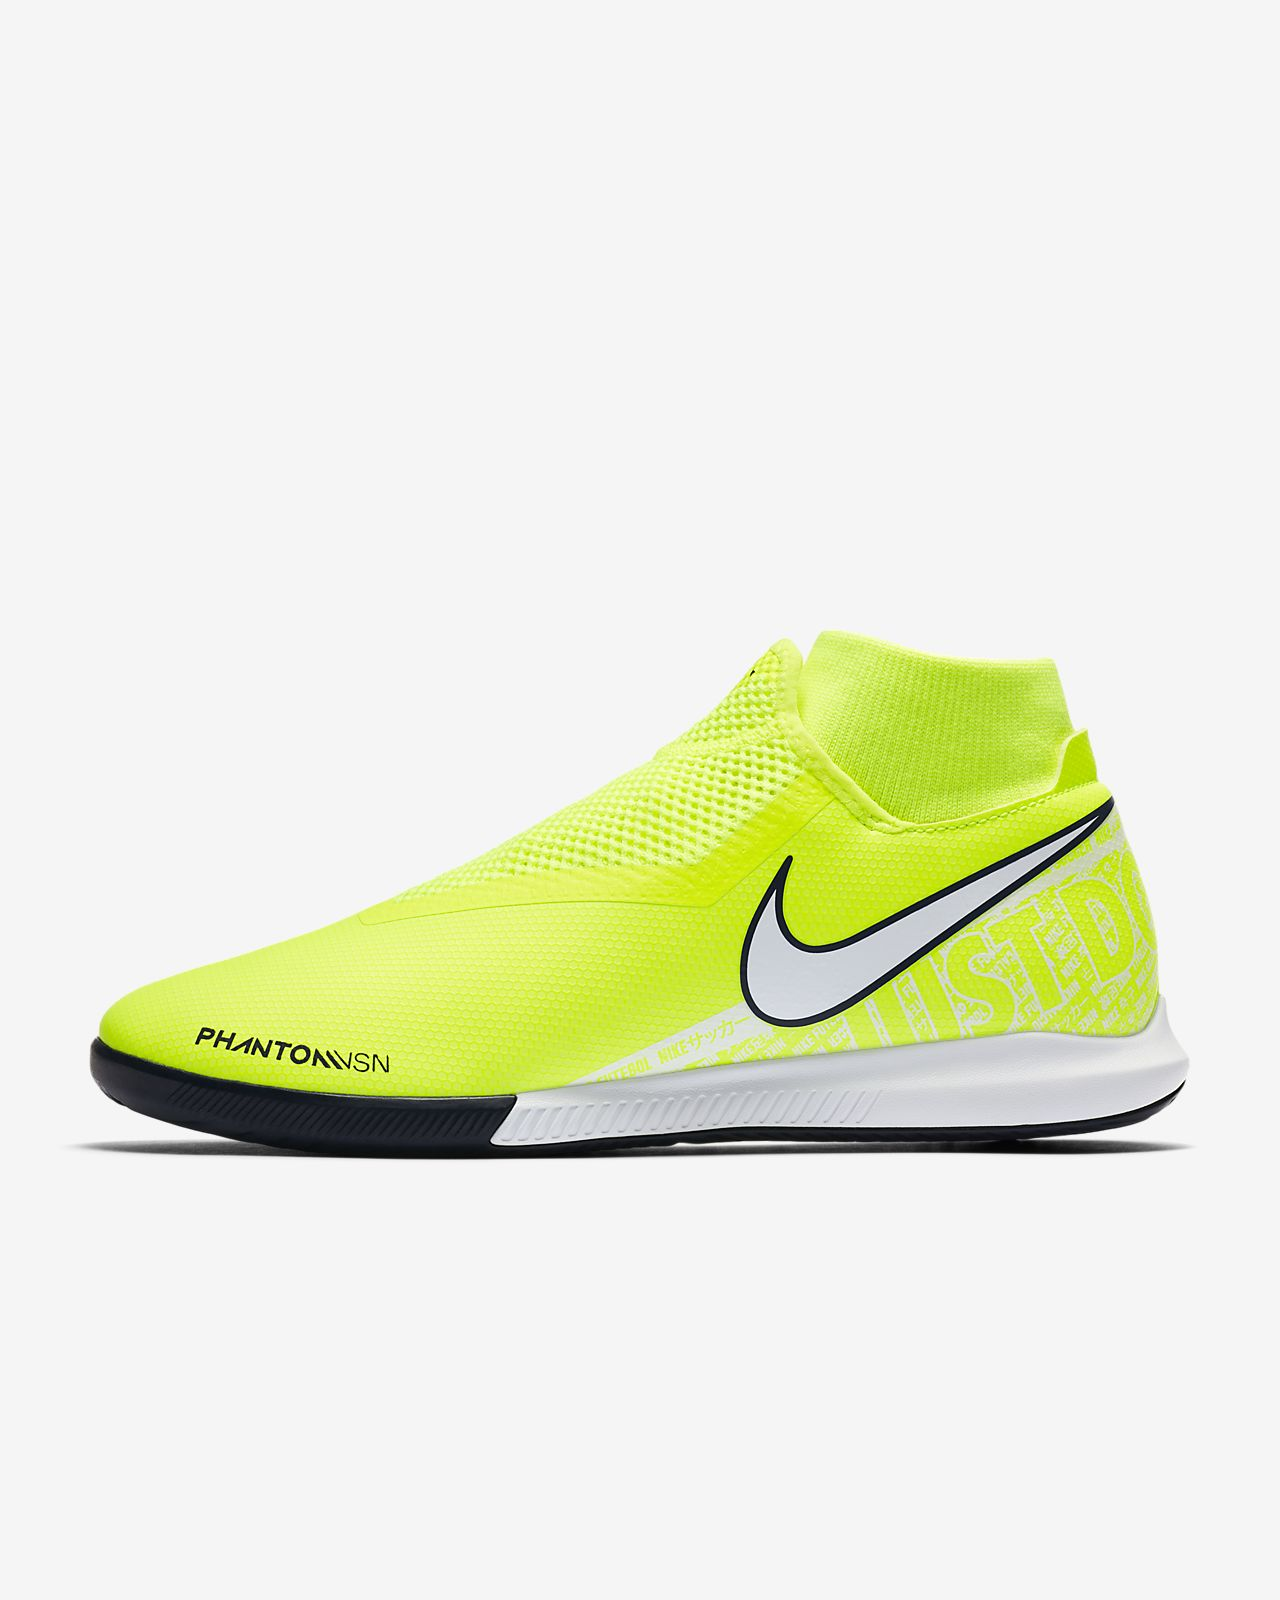 Nike Phantom Vision Academy Dynamic Fit IC Botas de fútbol sala